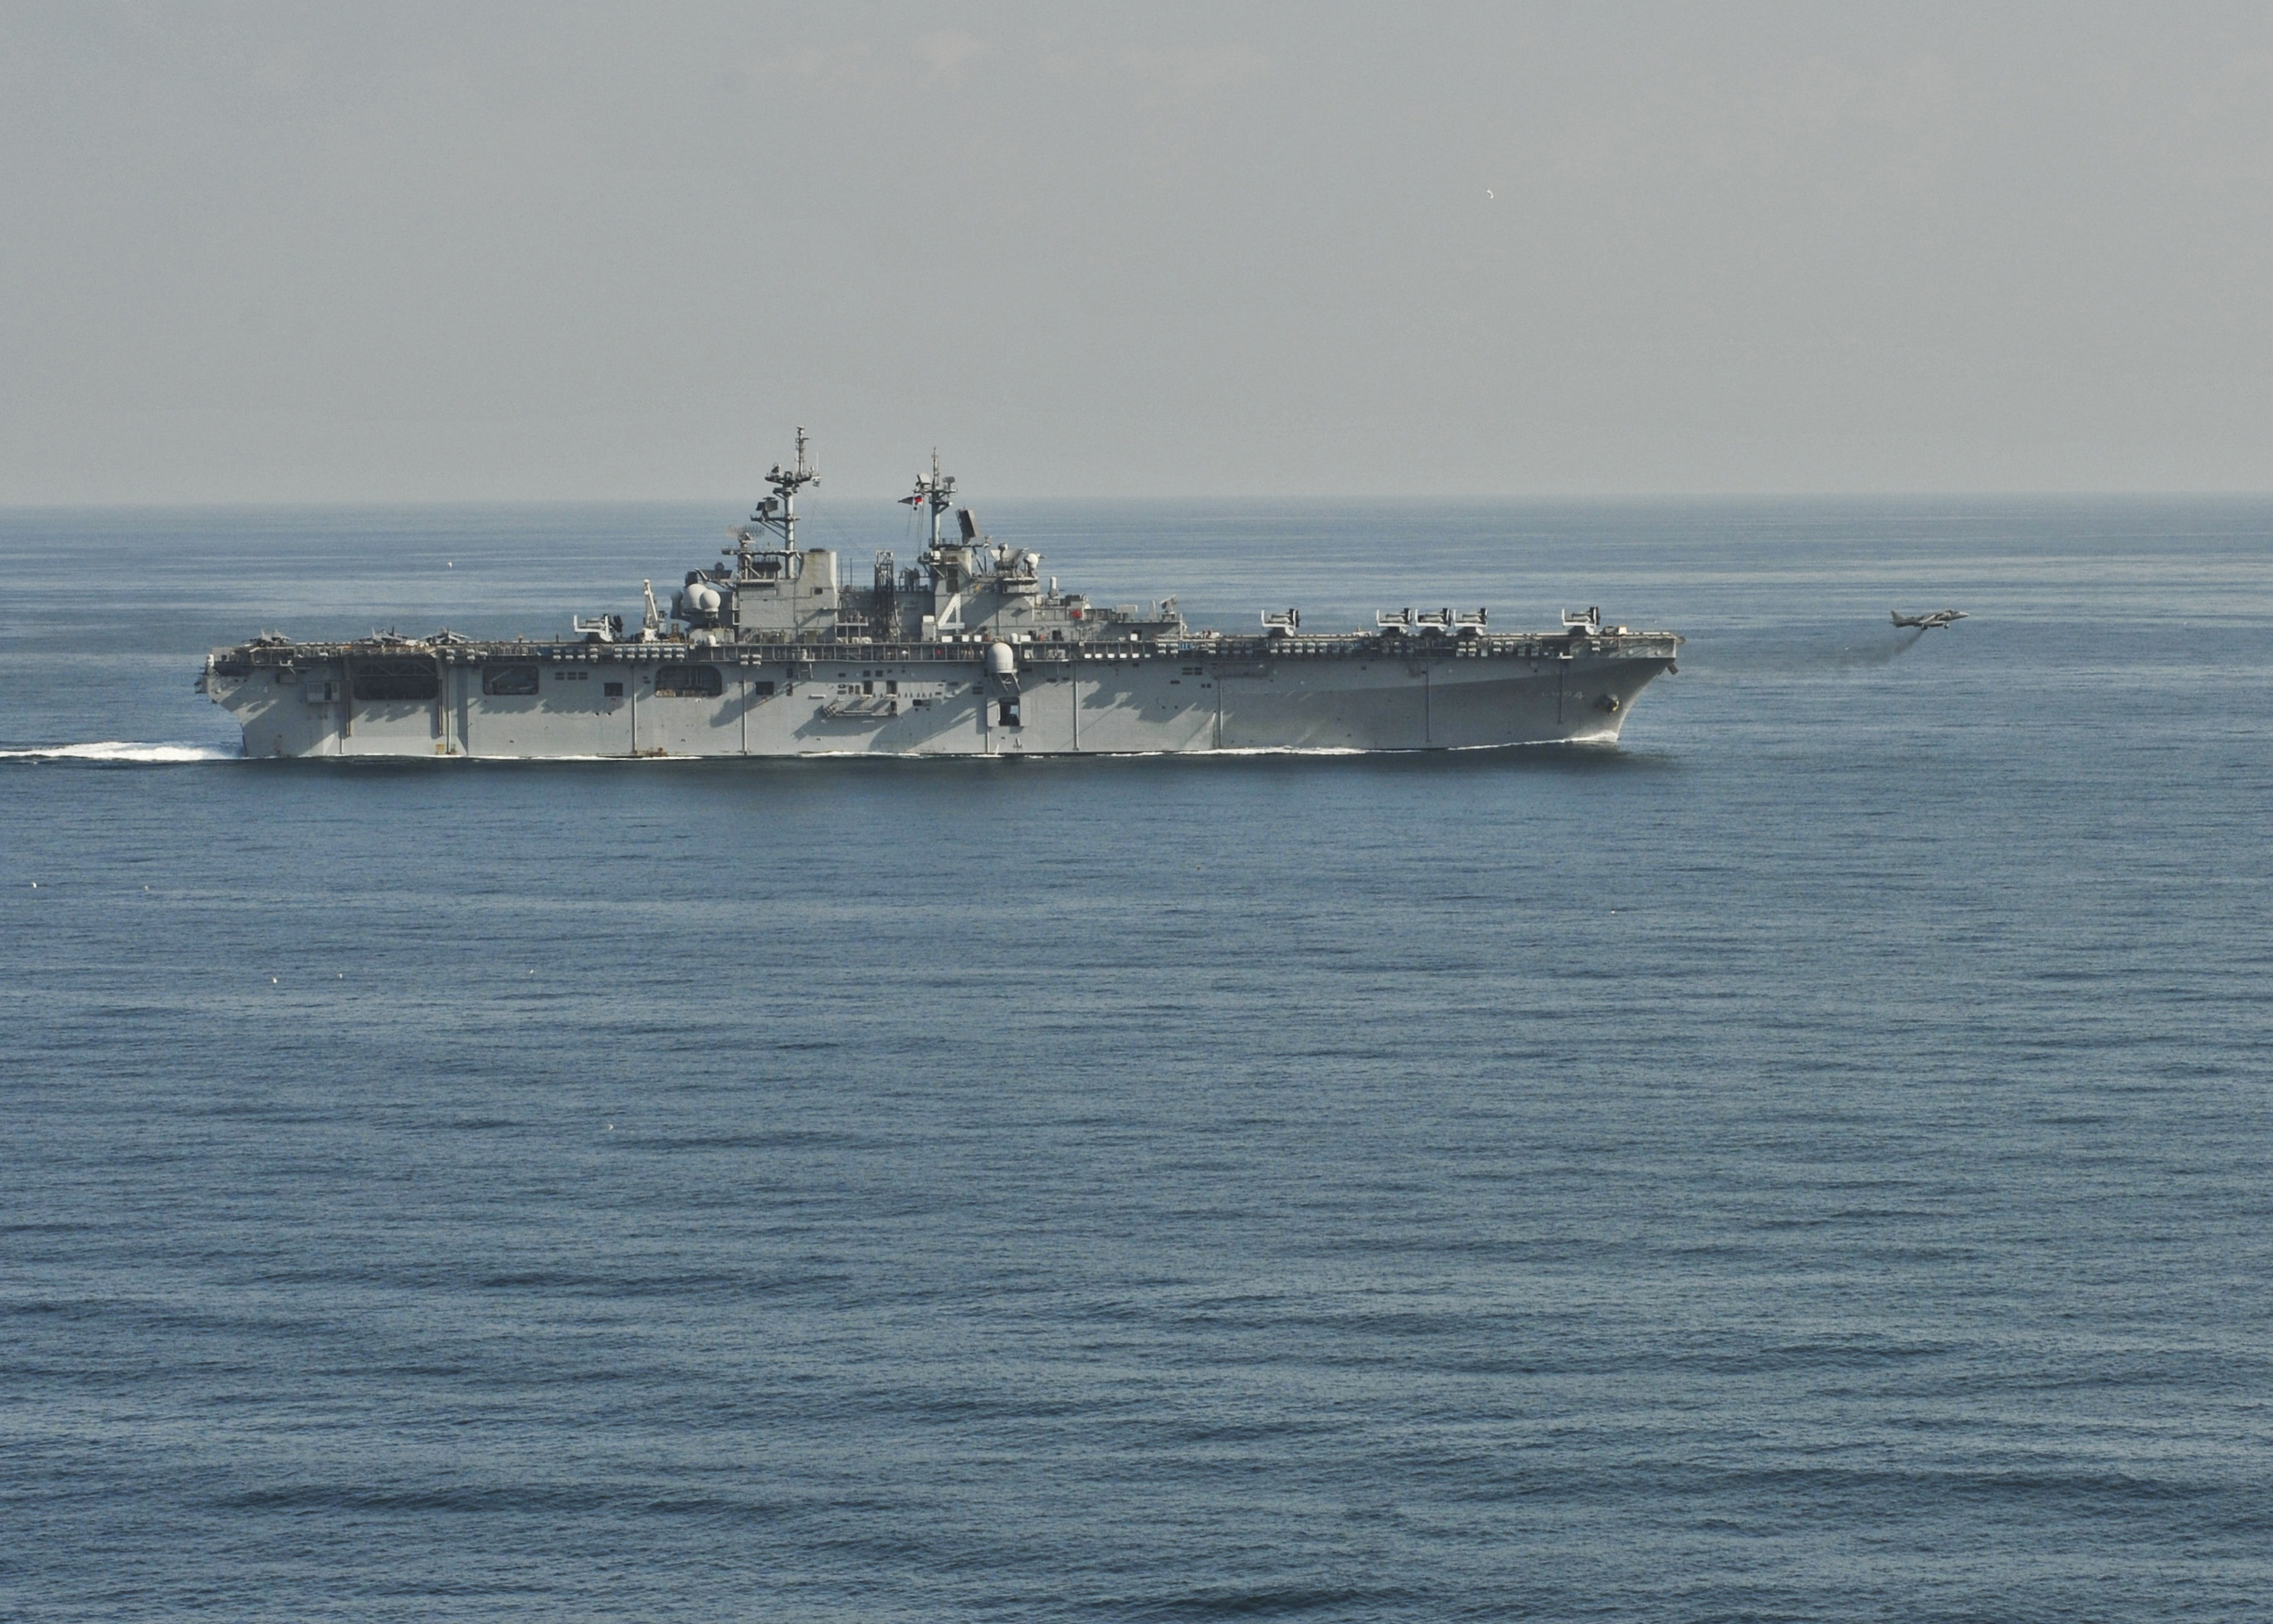 USS BOXER LHD-4 am 19.12.2013 im Arabischen Meer Bild: U.S. Navy